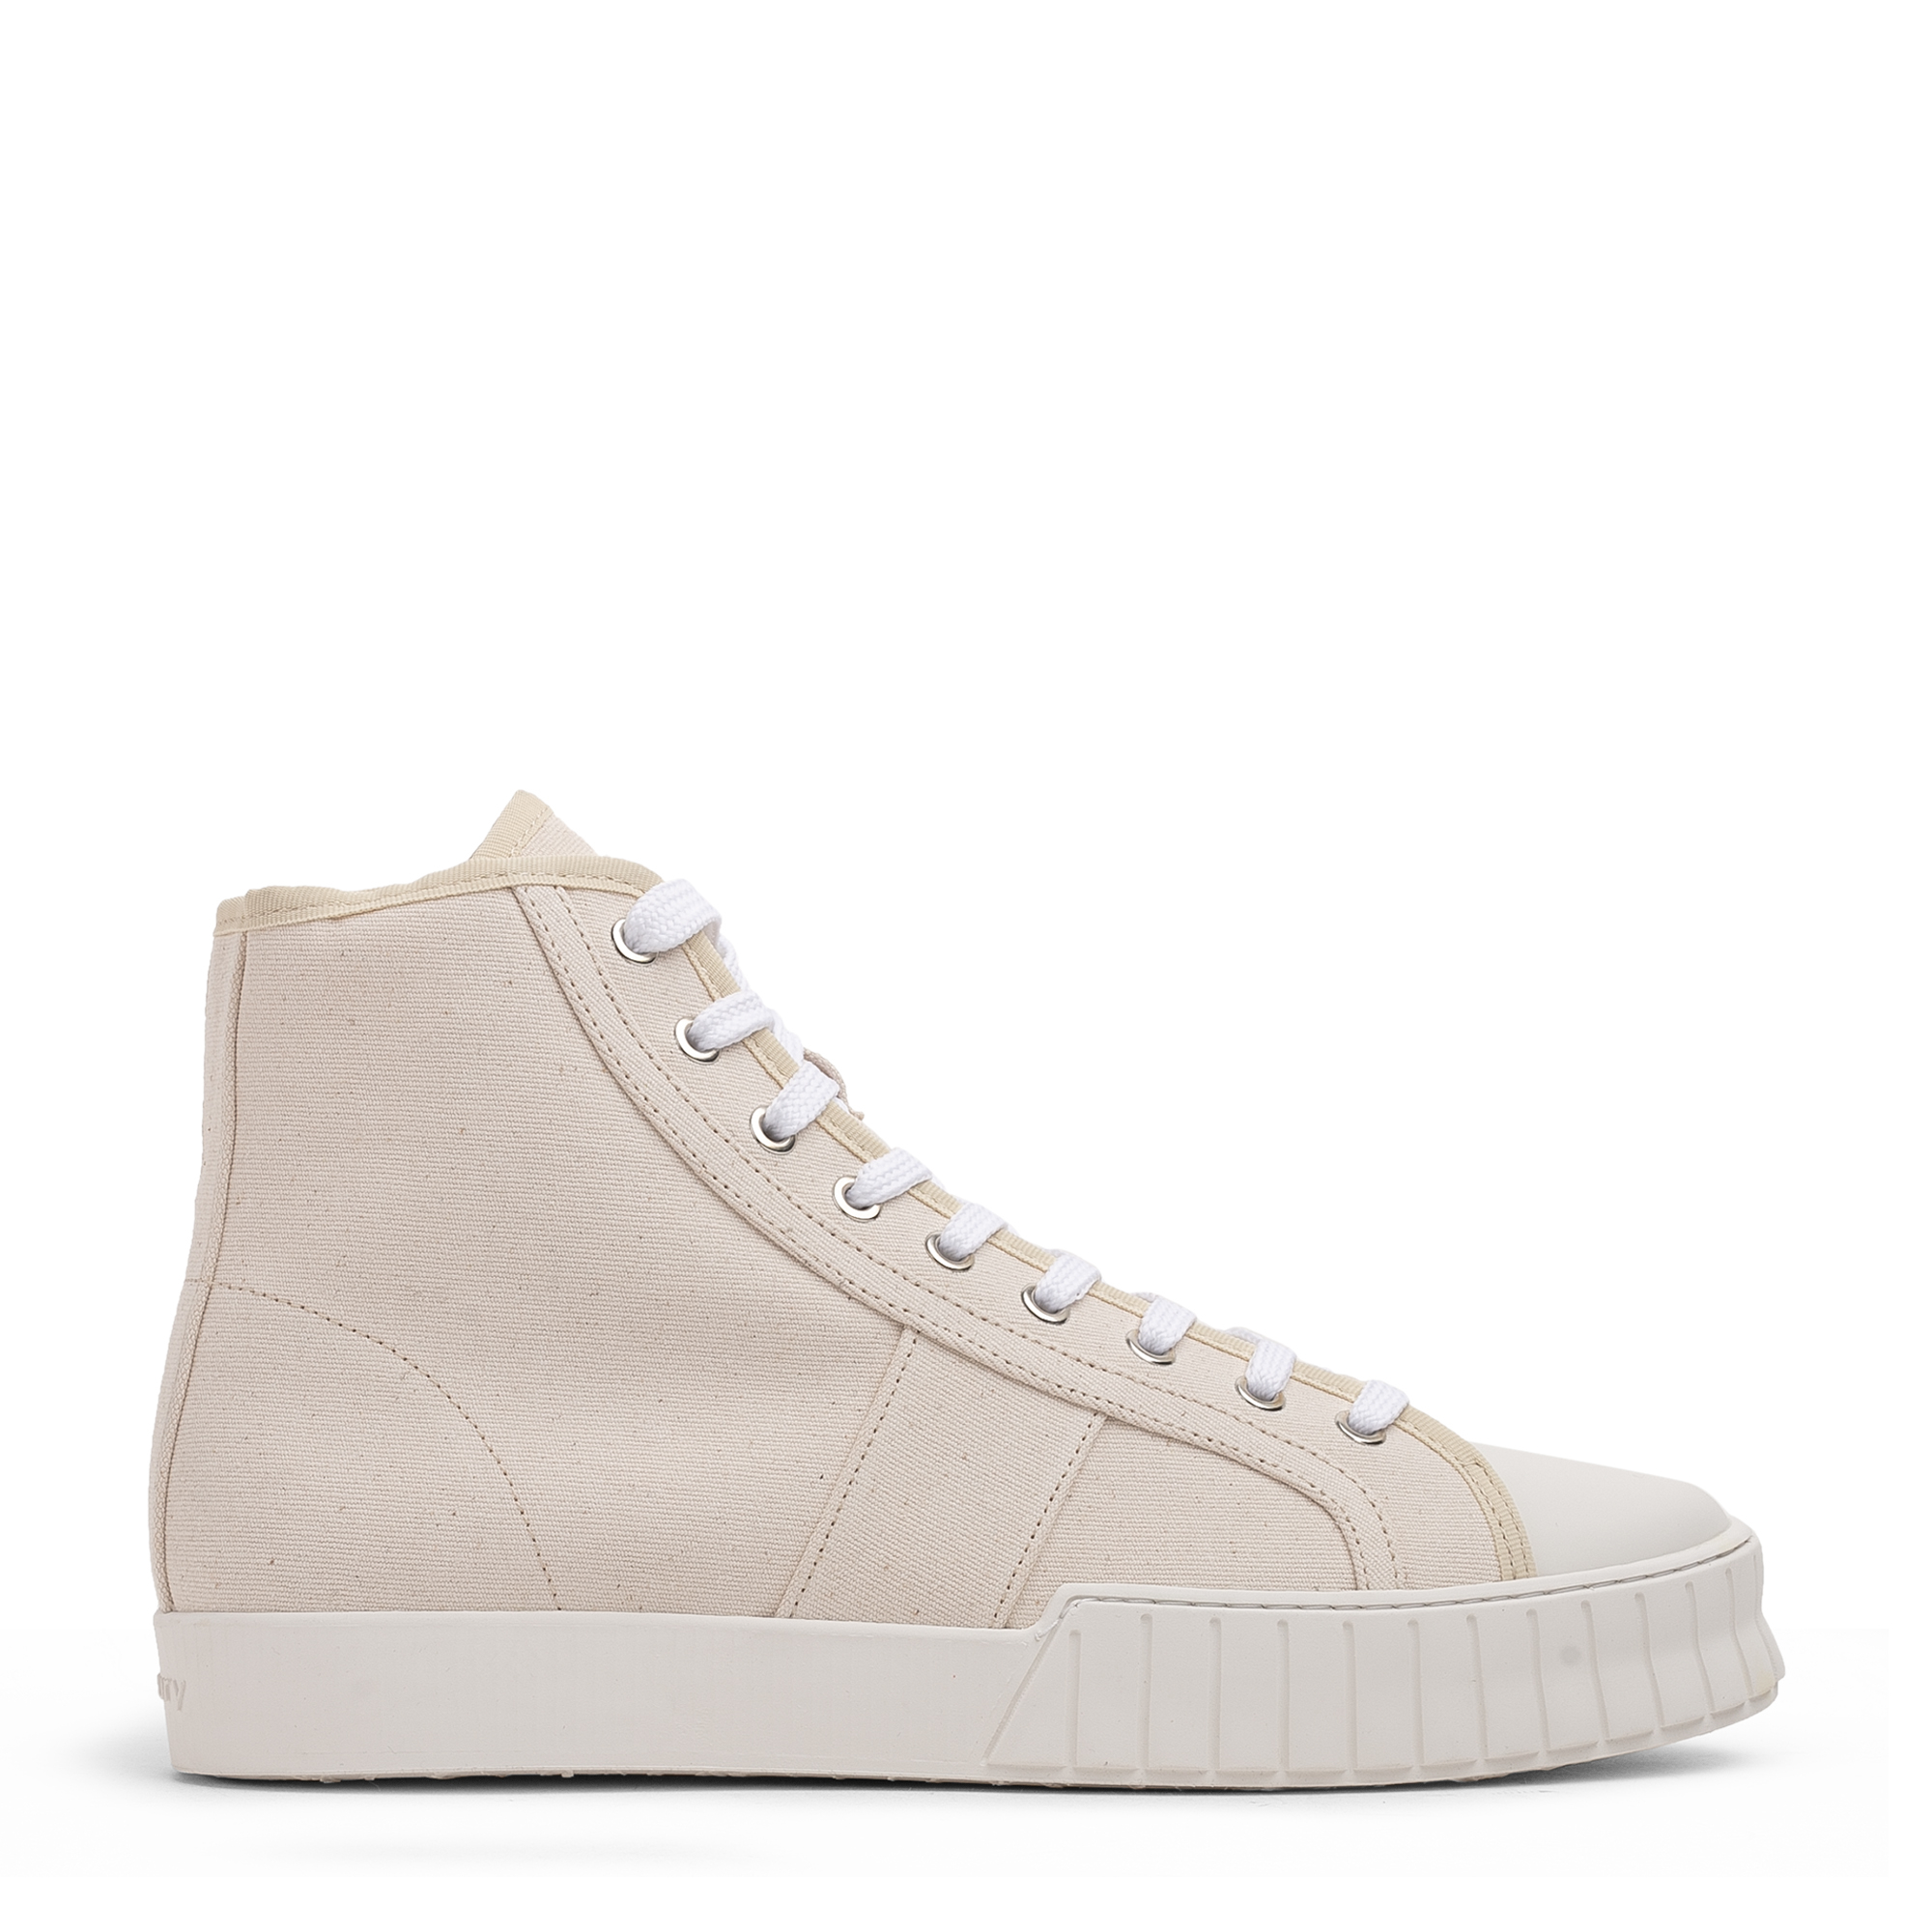 Divid Mid sneakers